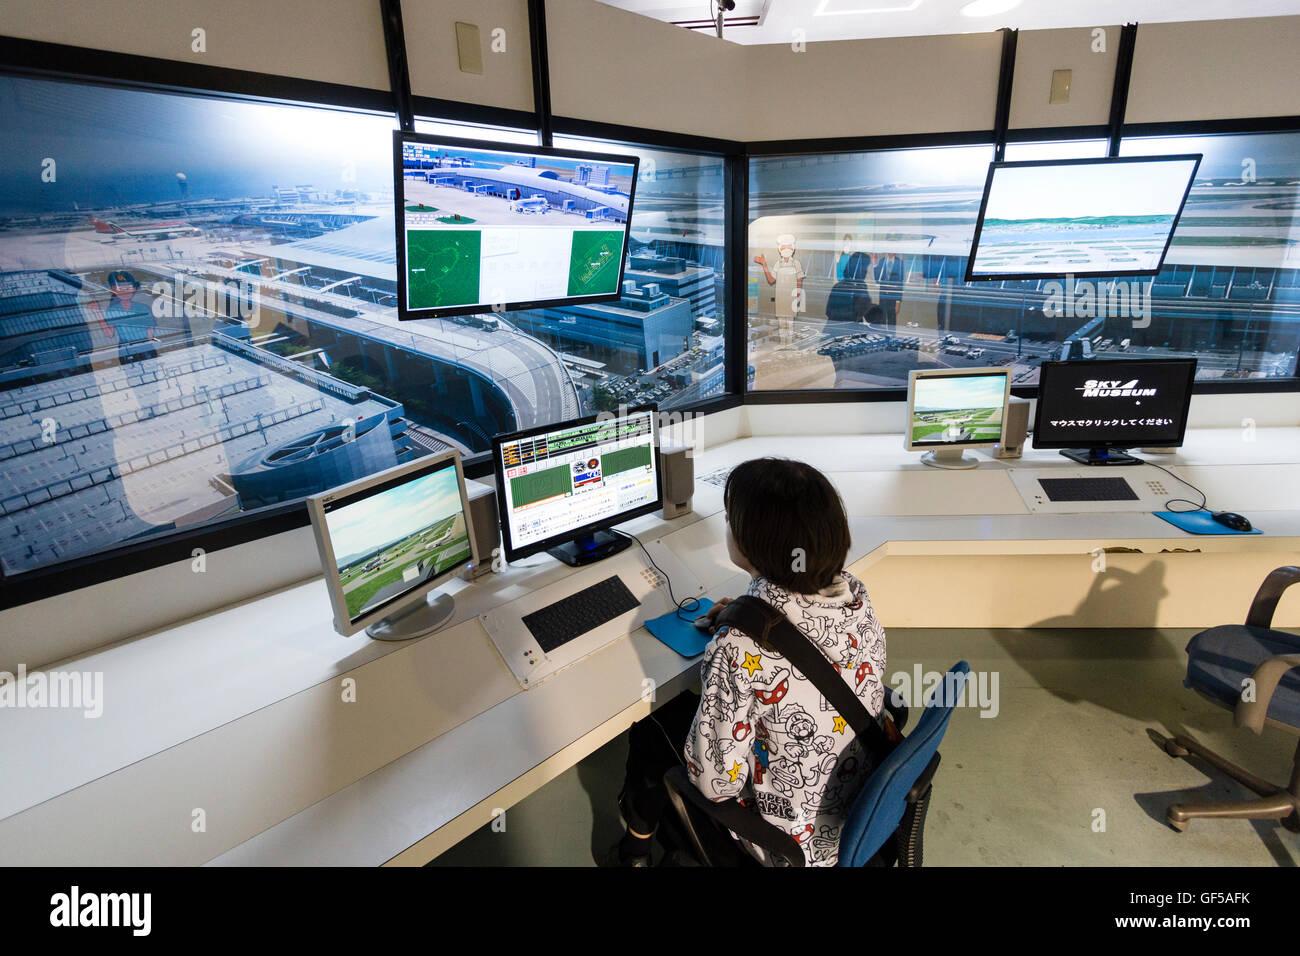 Japan, Kansai Airport, KIX. Sky Museum, Innenraum. Kaukasier Kind, 14 Jahre alter Junge, am Flugverkehr Flugregler Stockbild